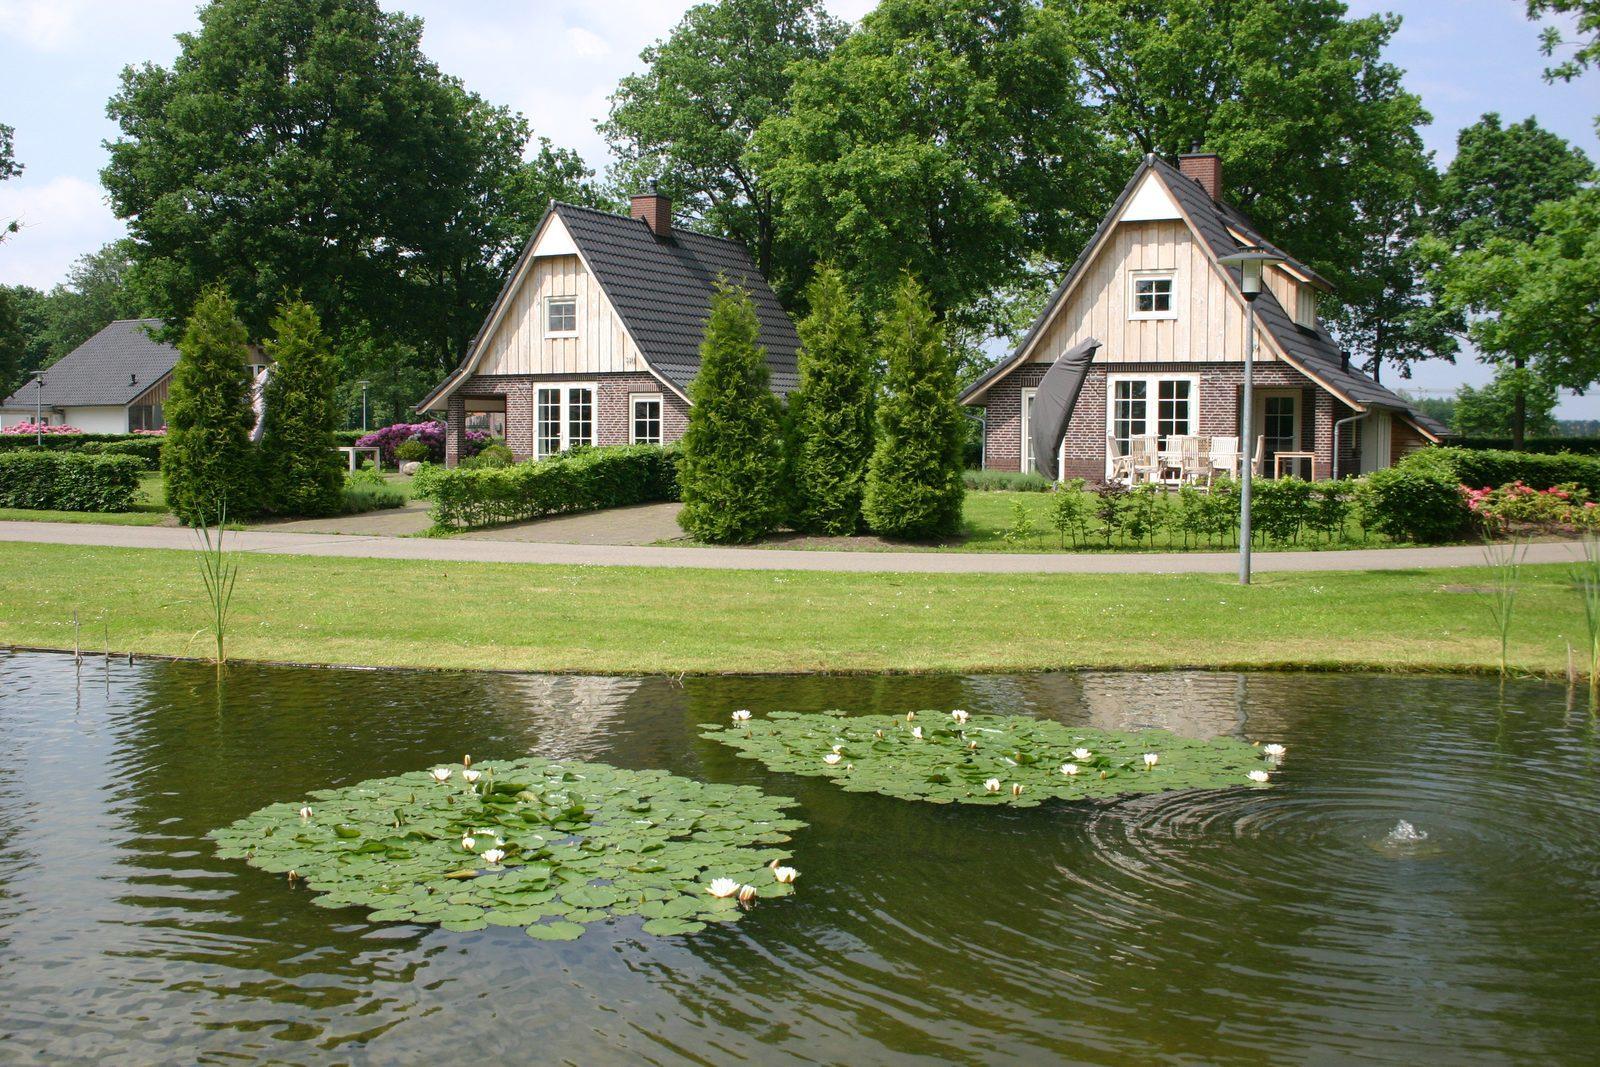 Twente Saxon architecture